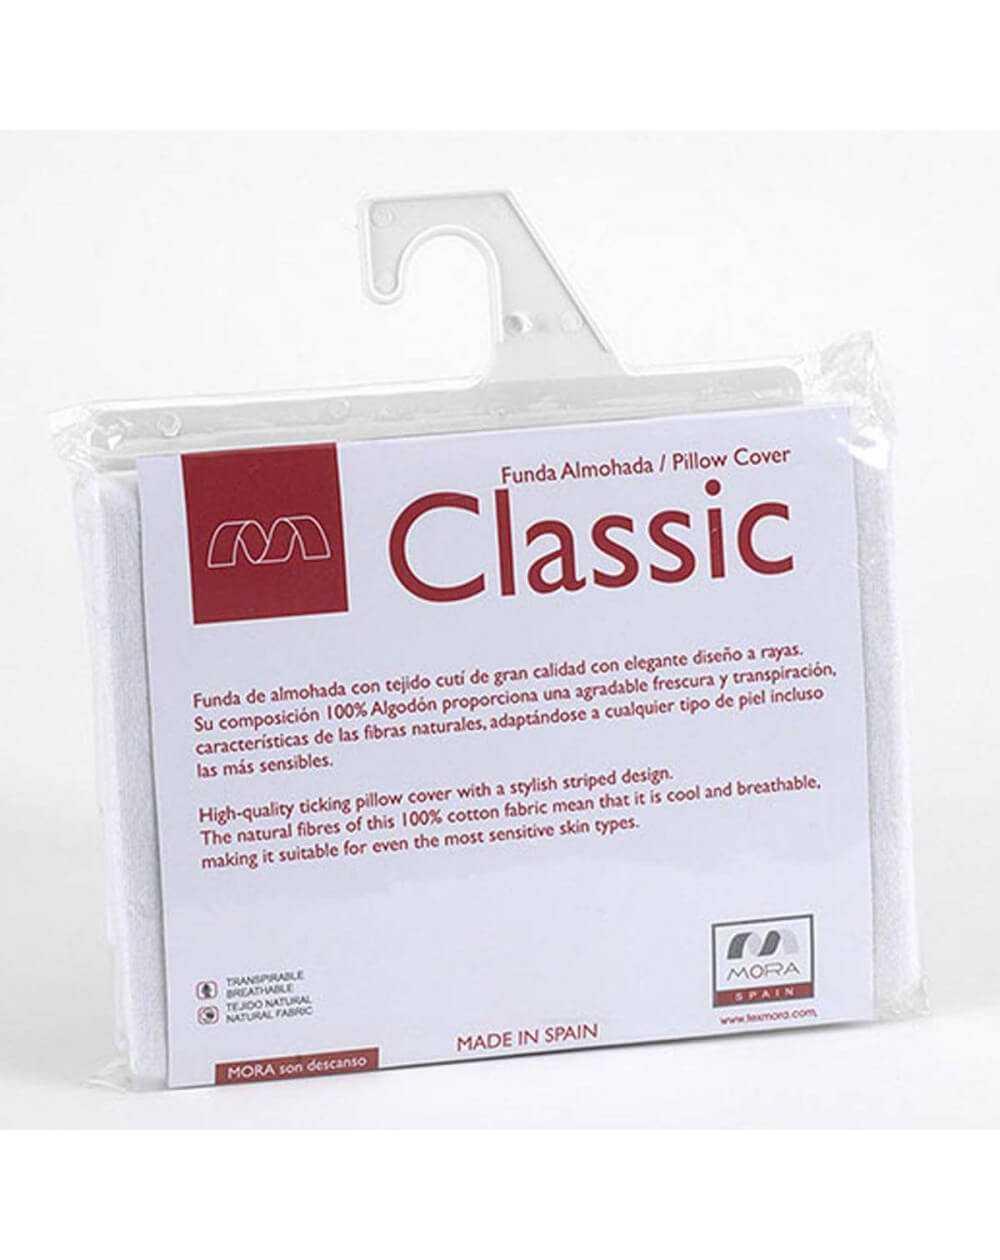 Funda de almohada CLASSIC 001 de Mora